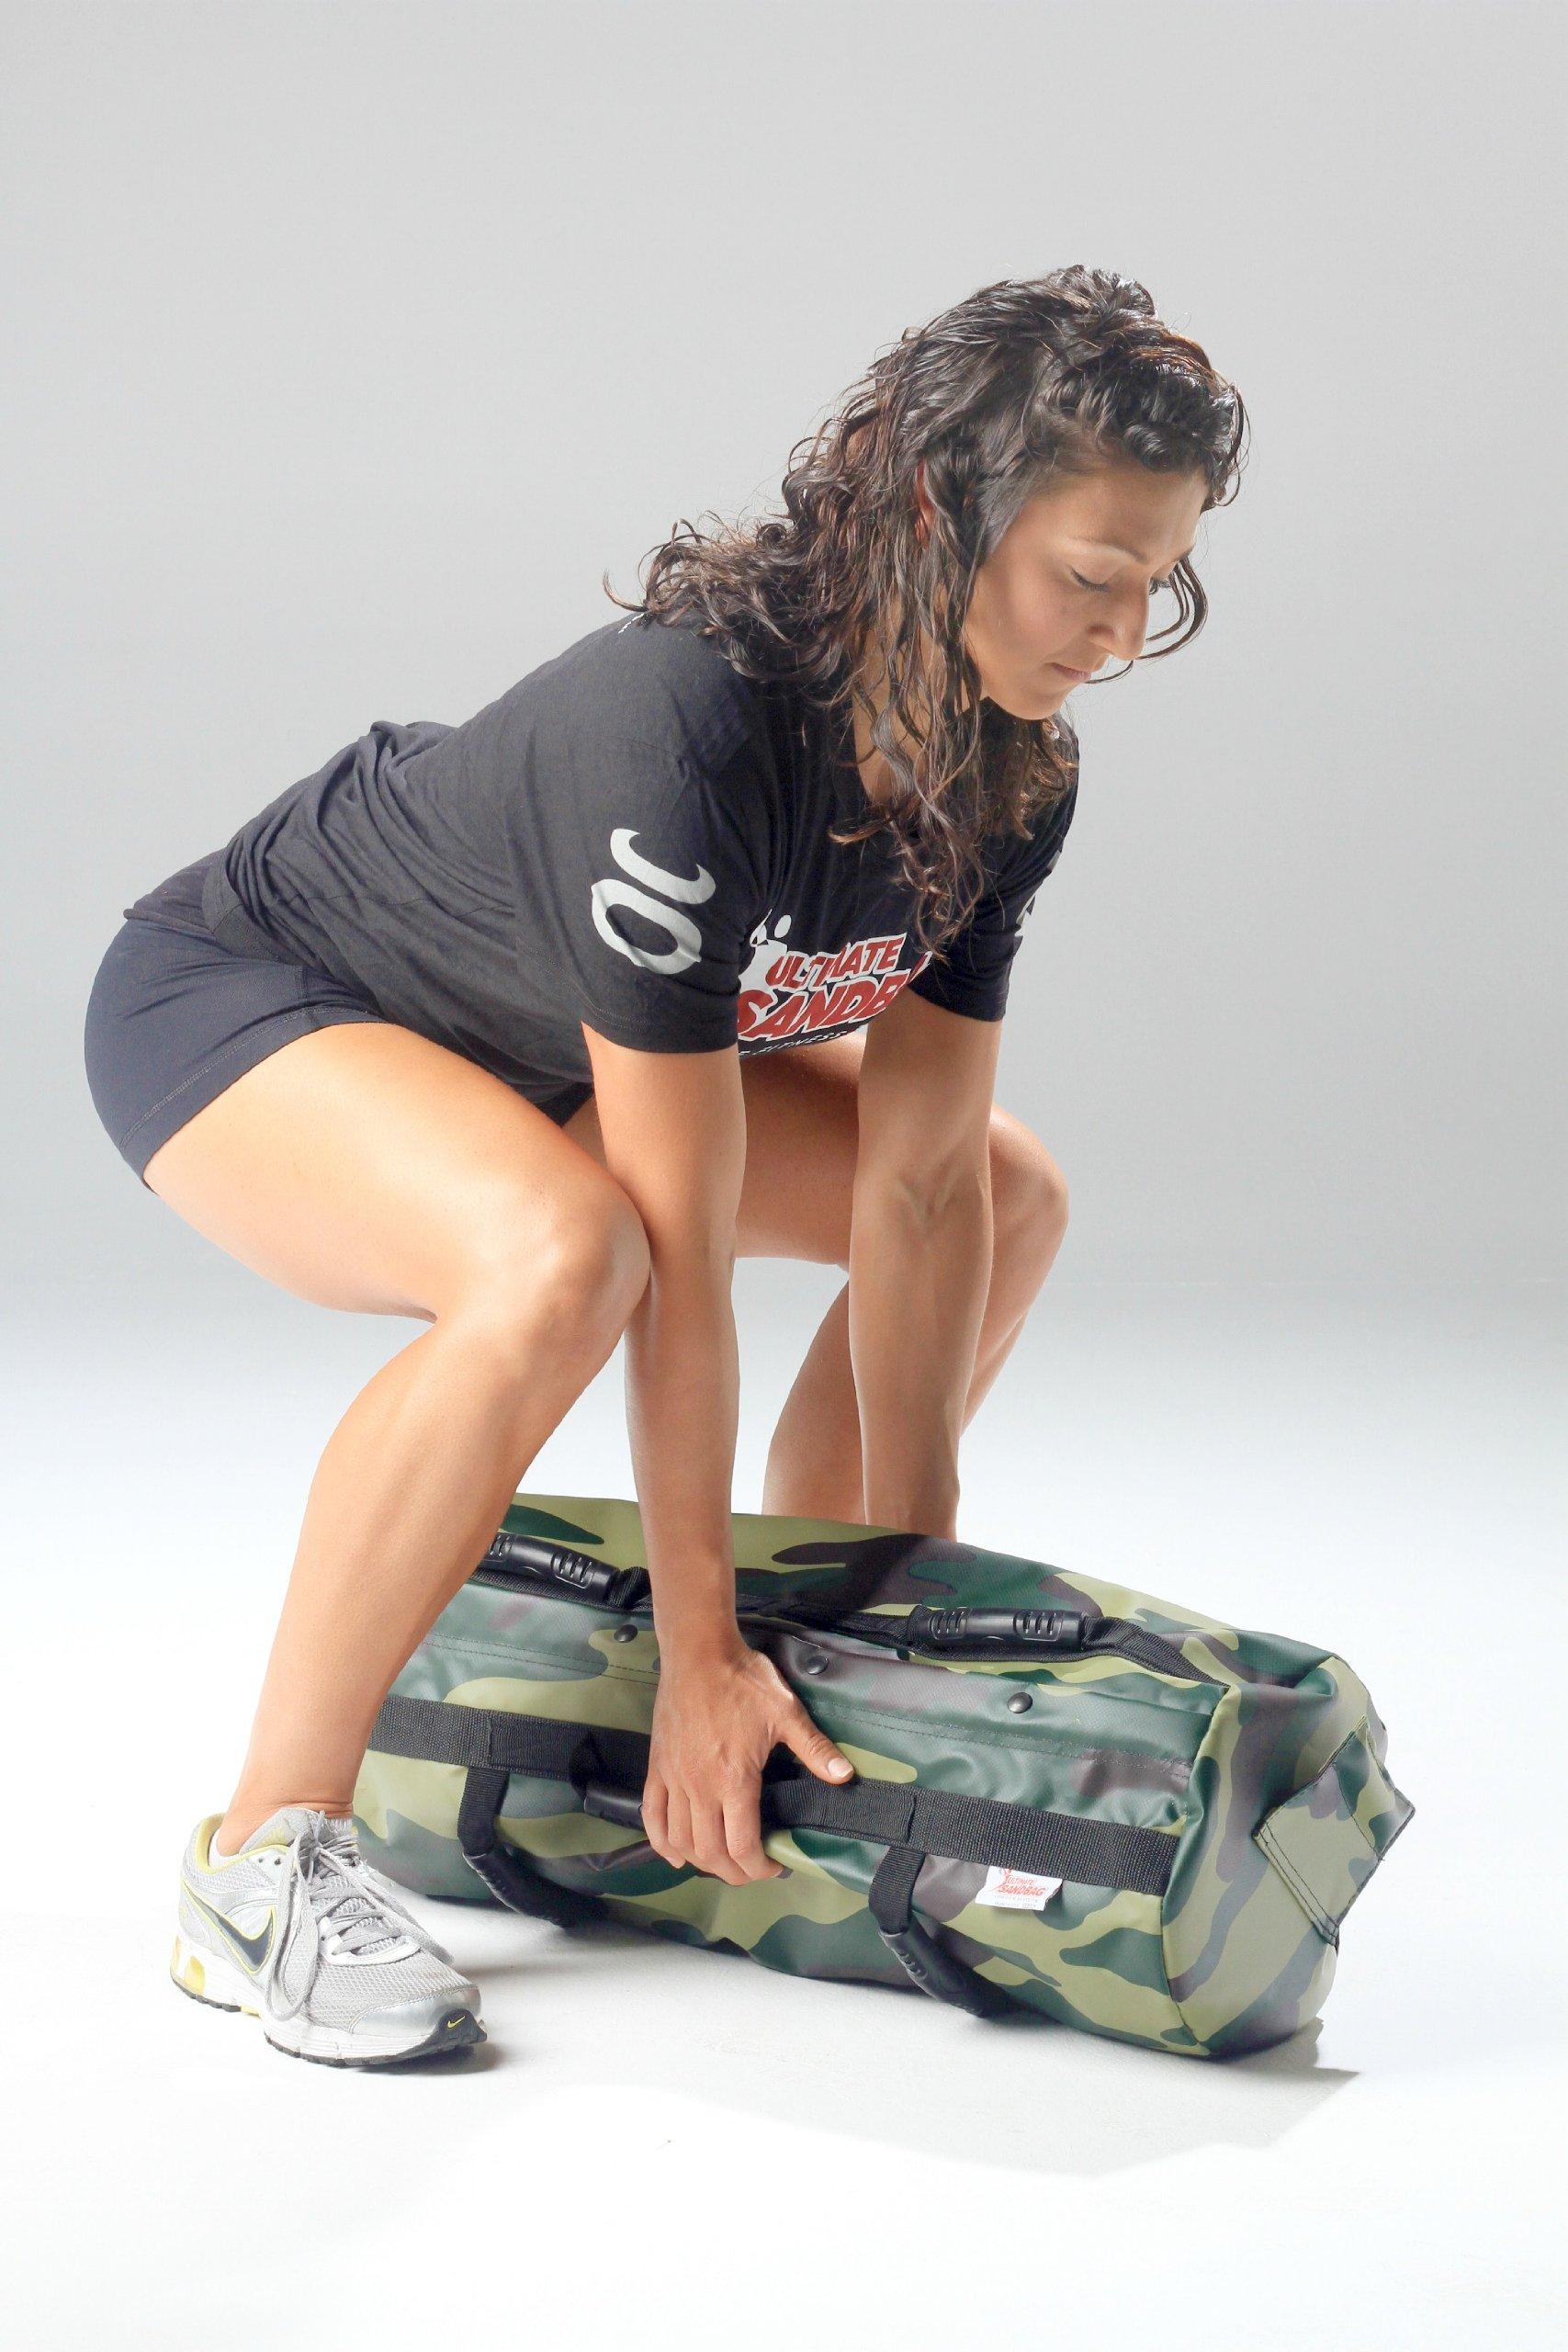 Ultimate Sandbag Training Strength Package - Camouflage Adjustable Fitness Sandbag with Filler Bags 40-80lbs by Ultimate Sandbag (Image #2)